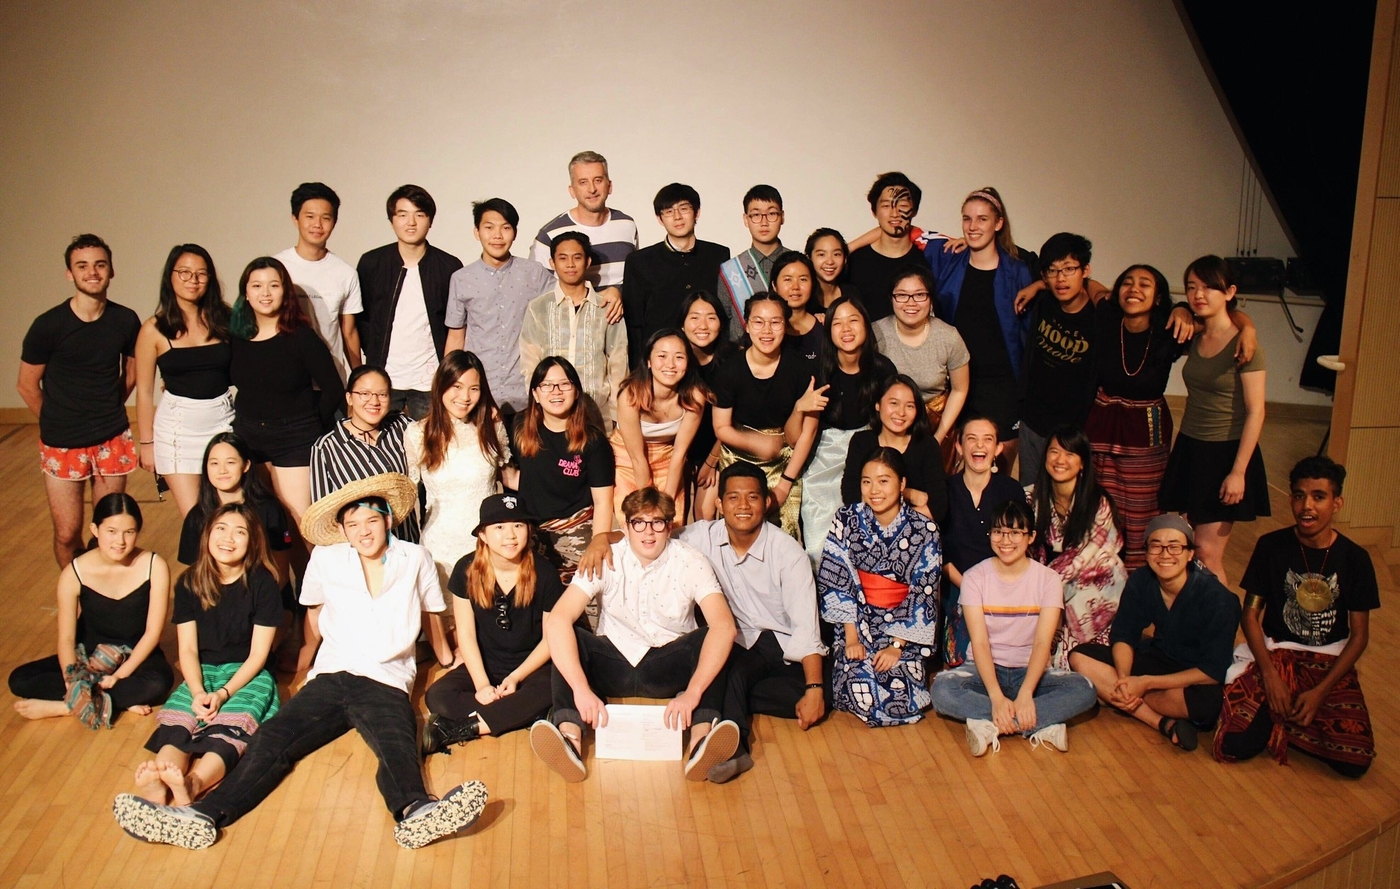 Li Po Chun United World College Hong Kong students